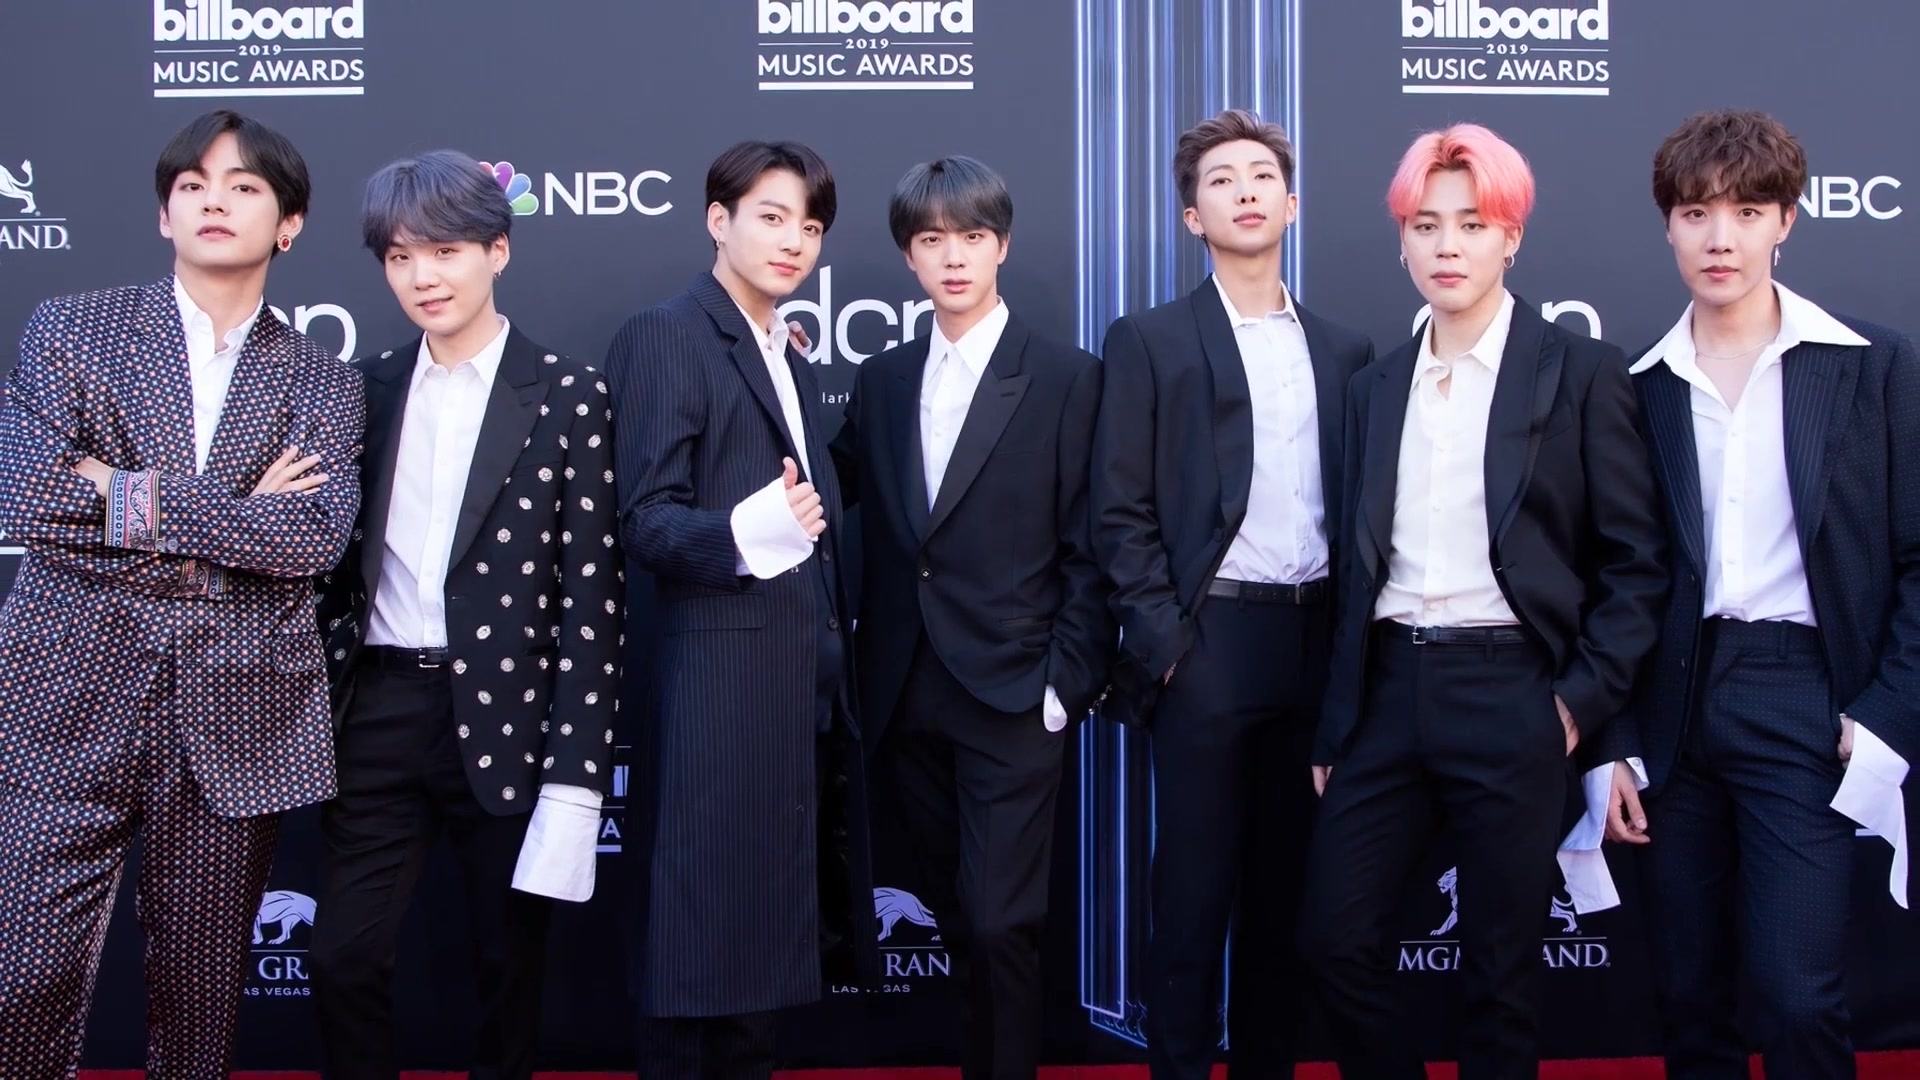 BTS at Billboard Awards Red Carpet in 2019